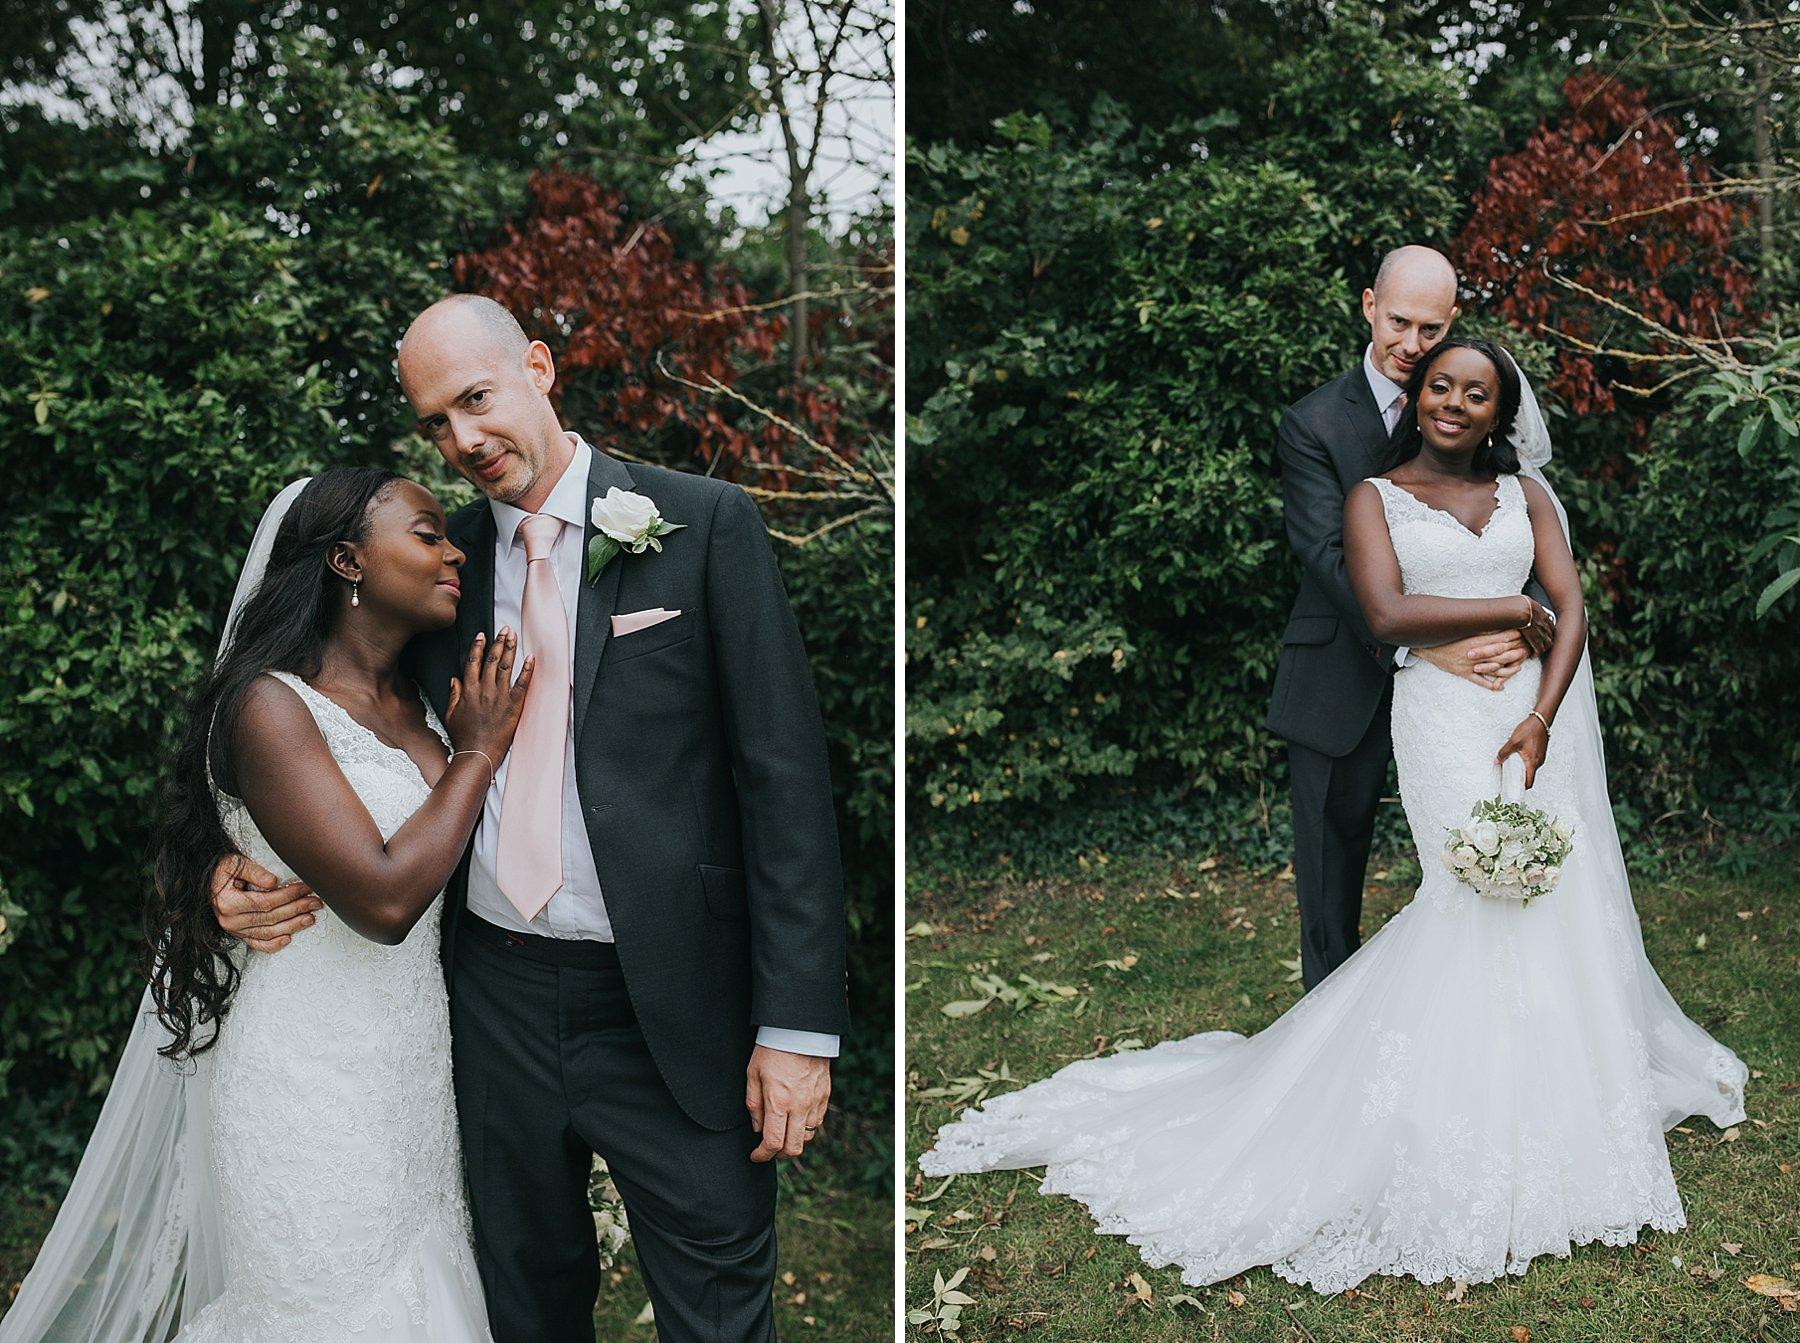 181-Belair House Dulwich groom bride wedding photos.jpg